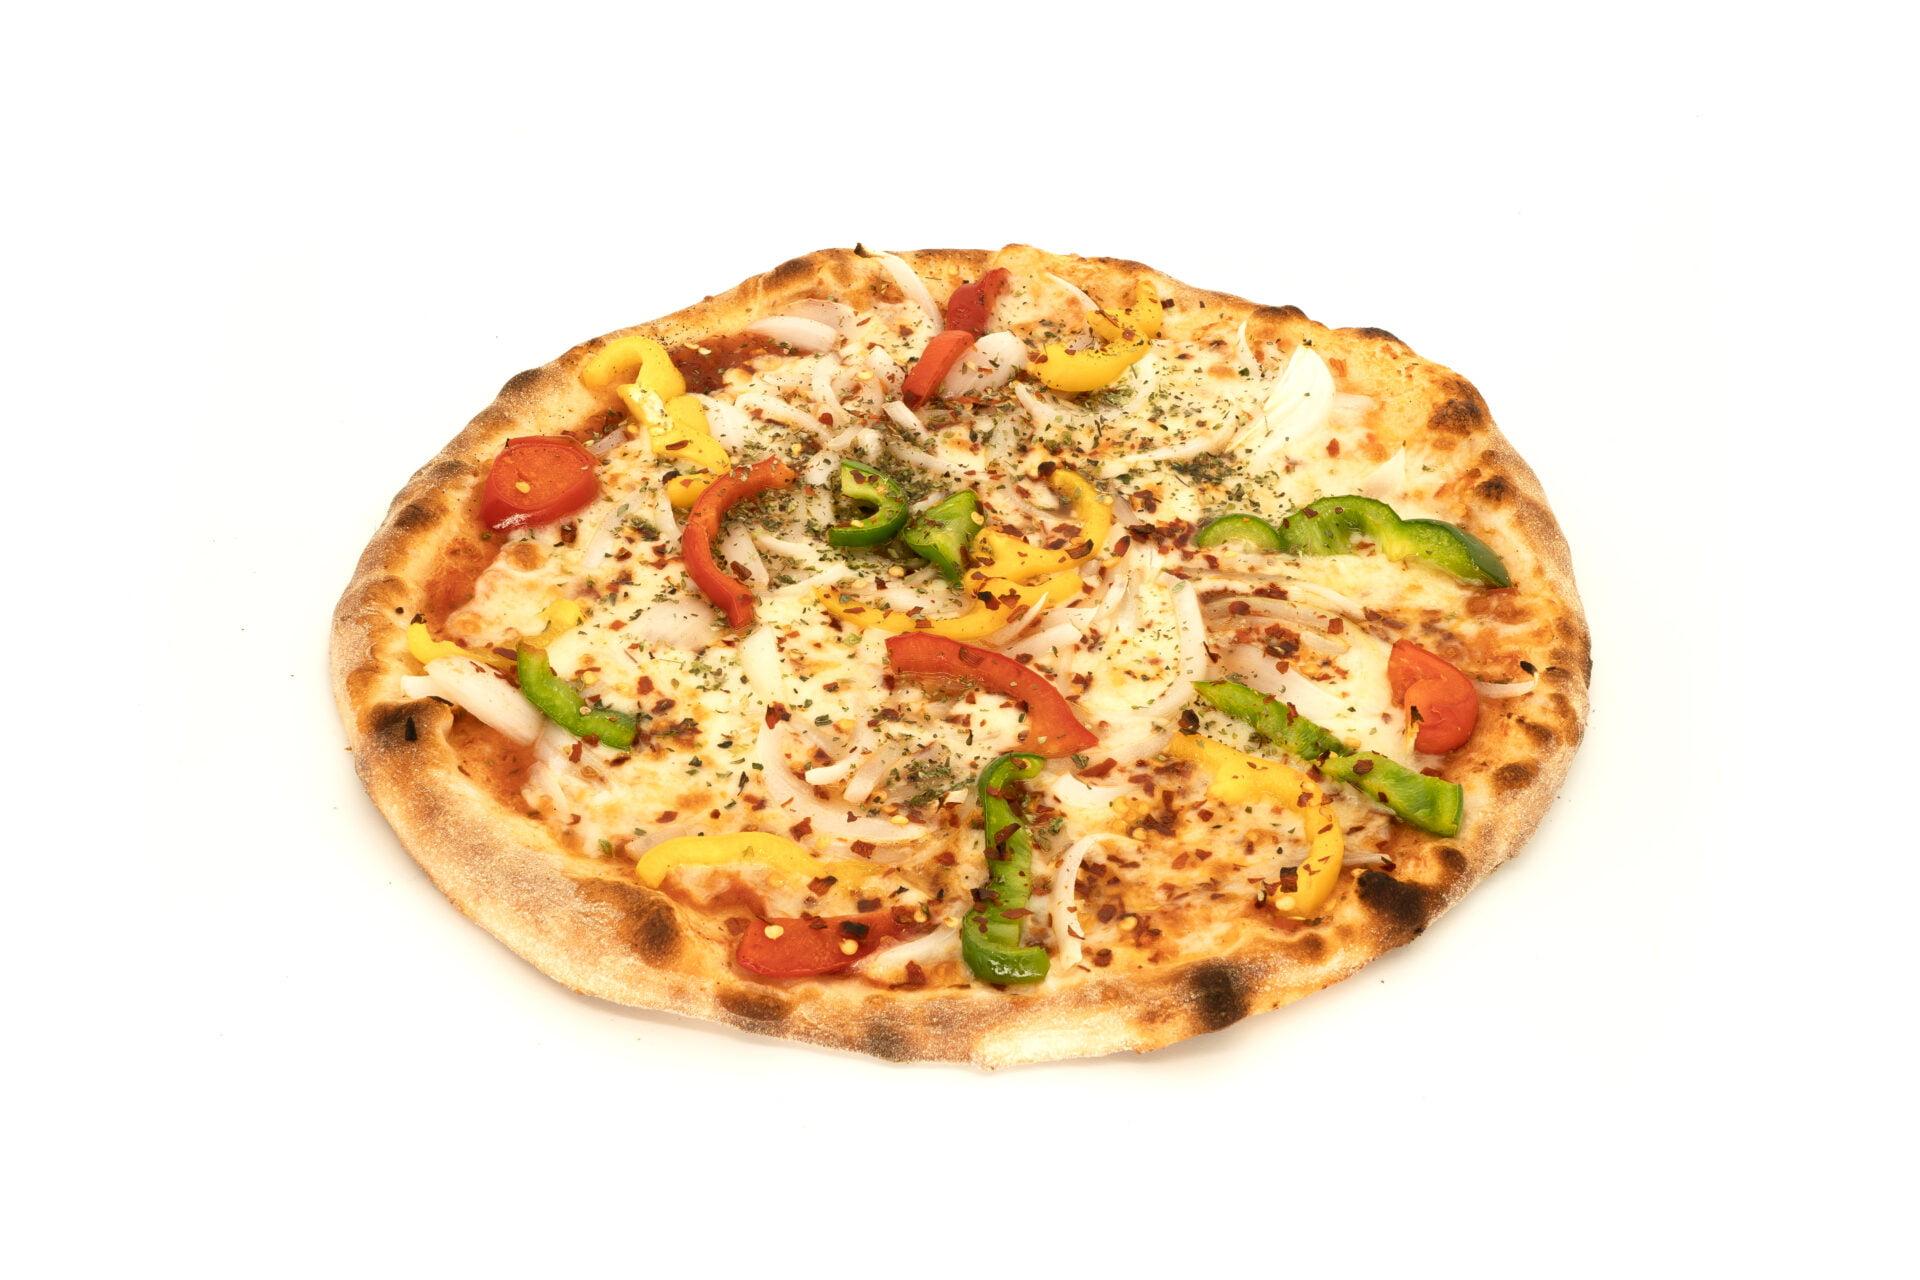 Best Pizza - Pizza Diavolo